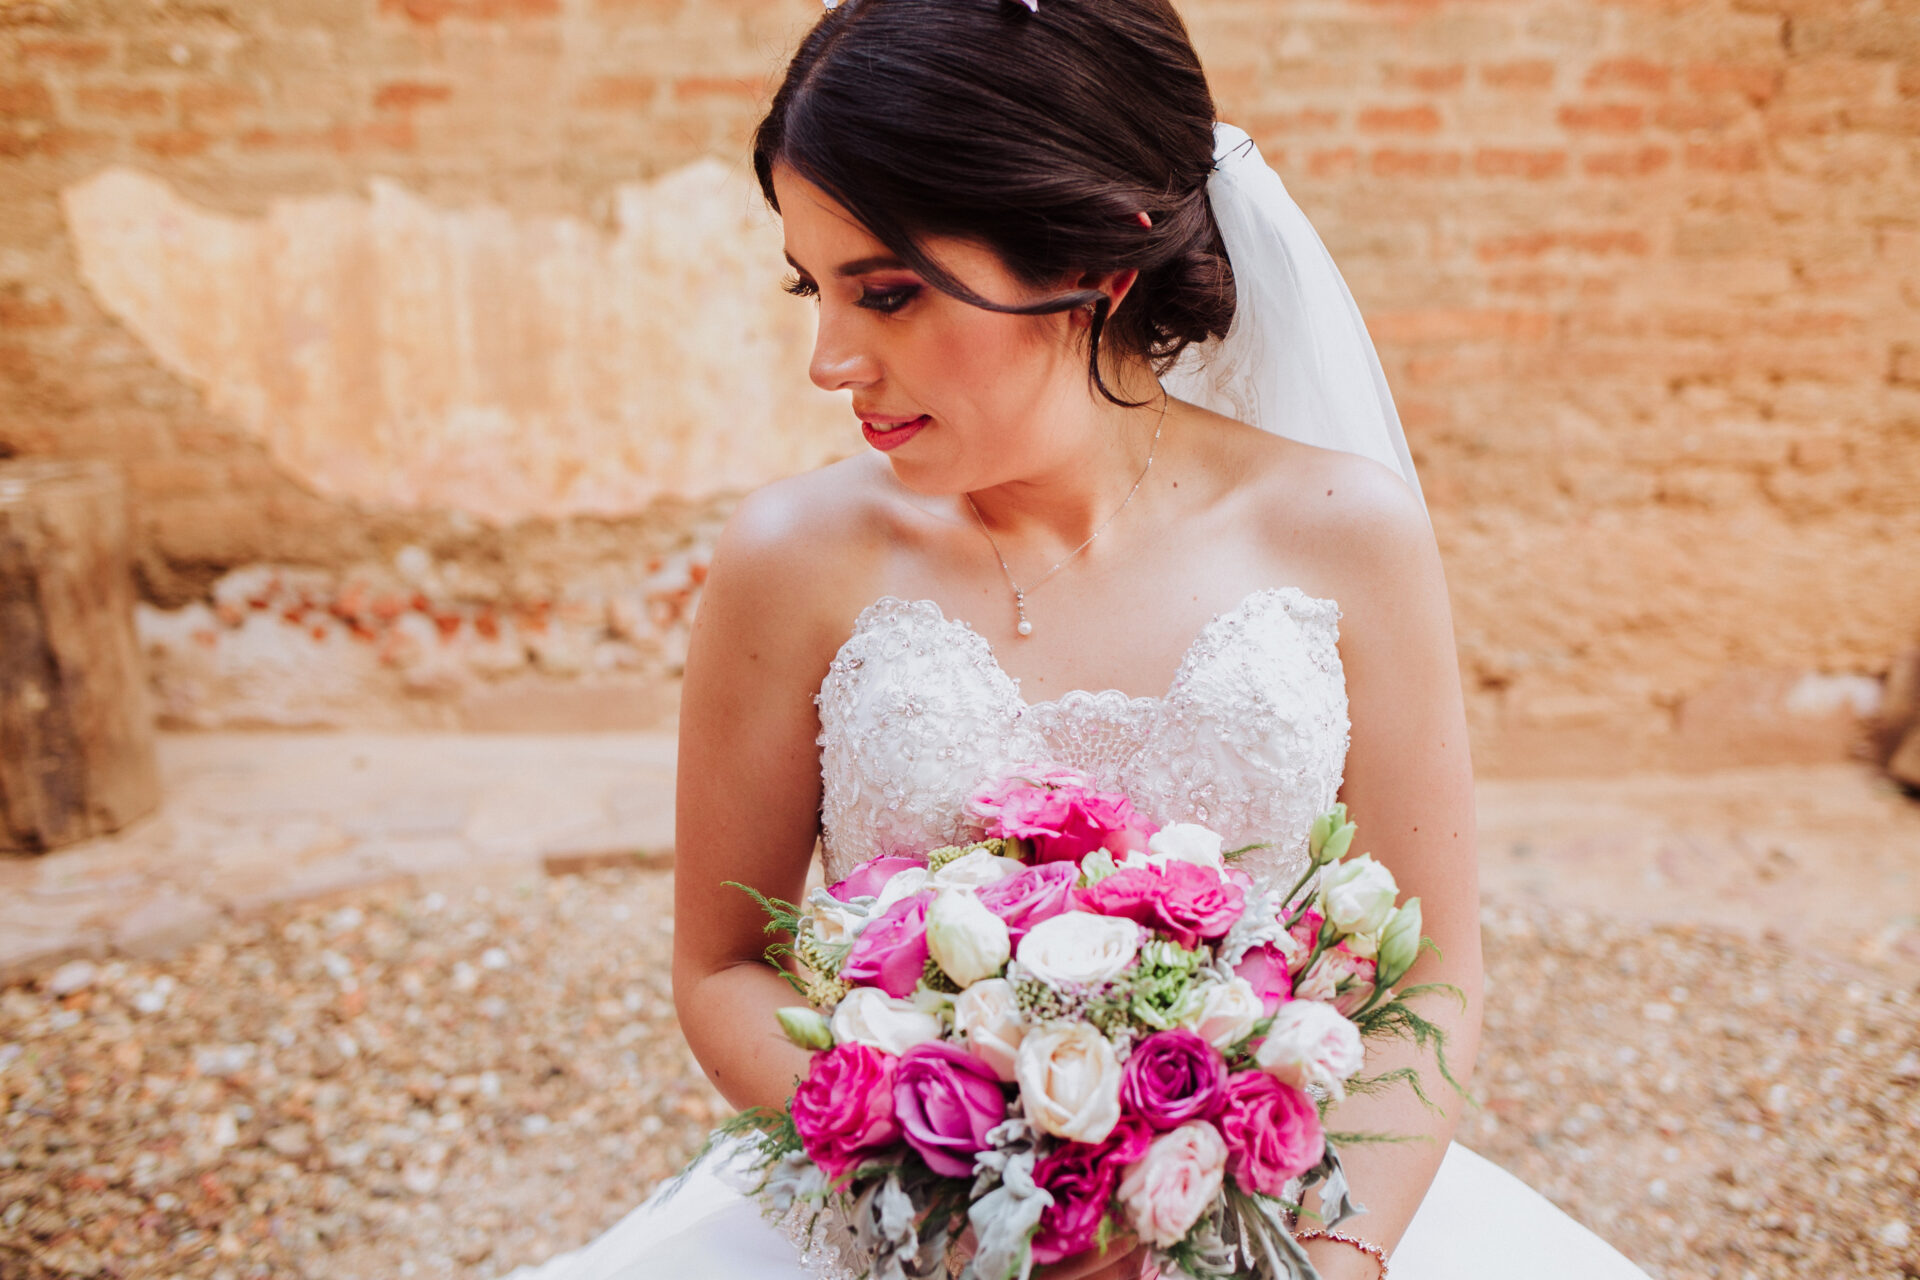 javier_noriega_fotografo_bodas_exhacienda_las_mercedes_zacatecas_wedding_photographer21a